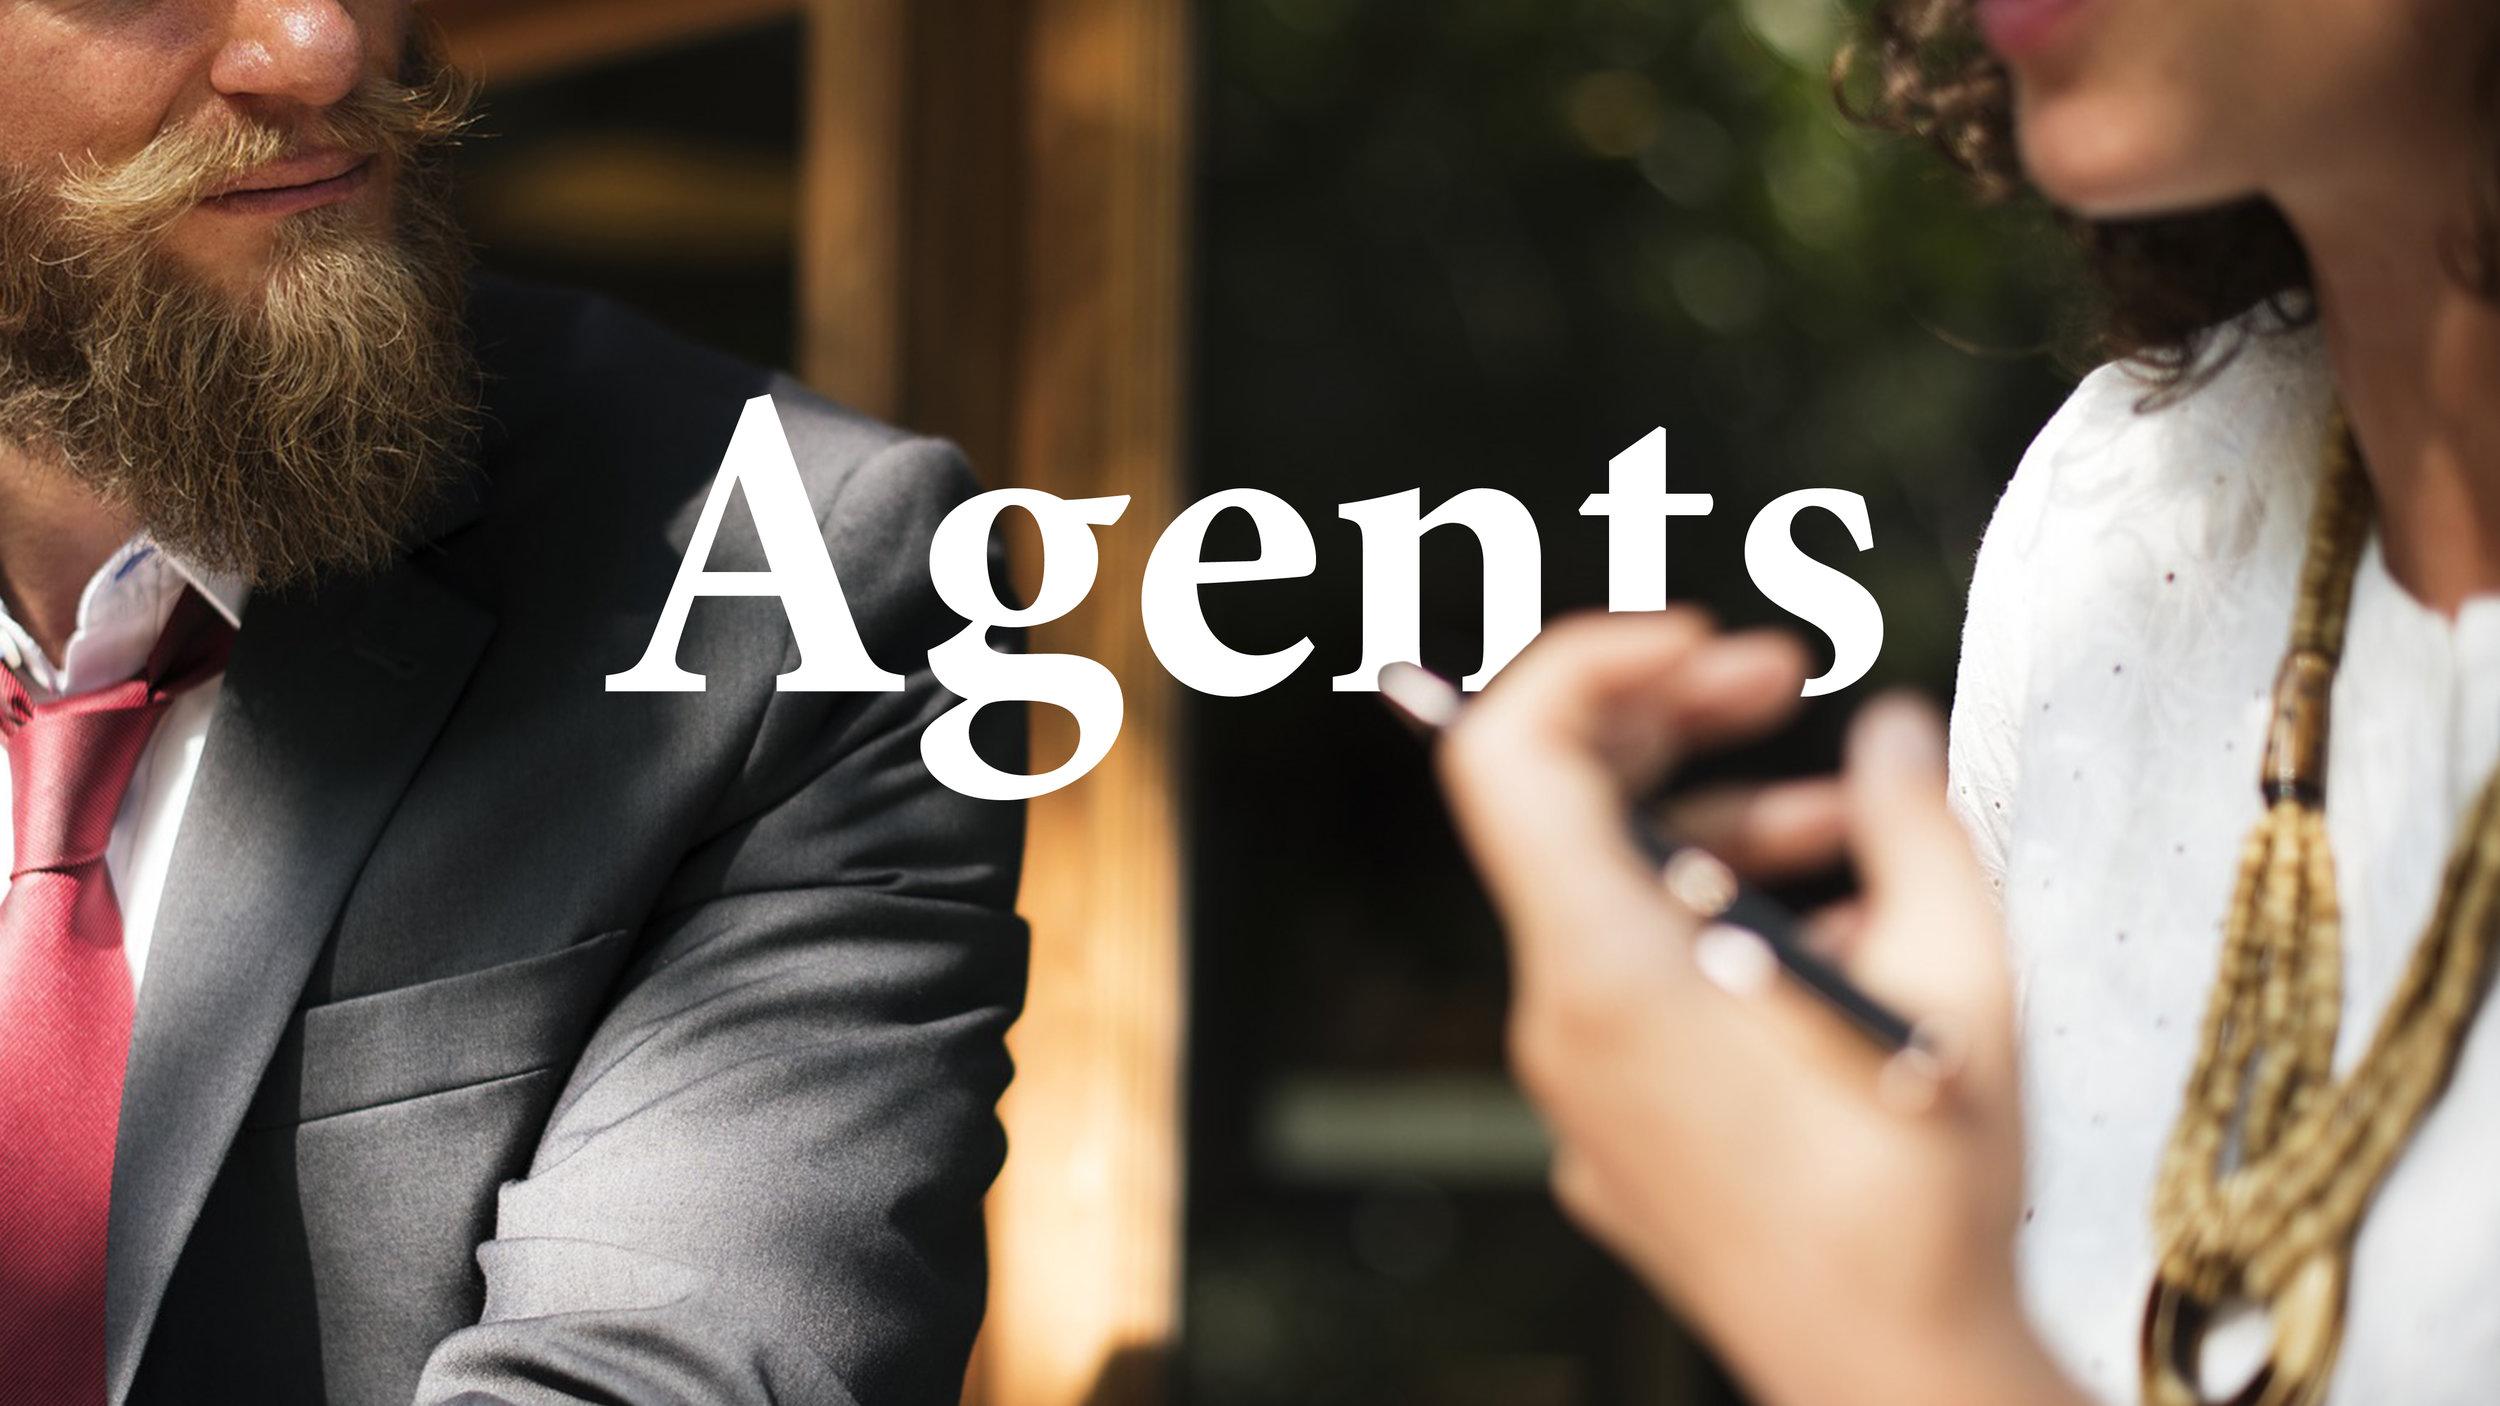 Agents.jpg